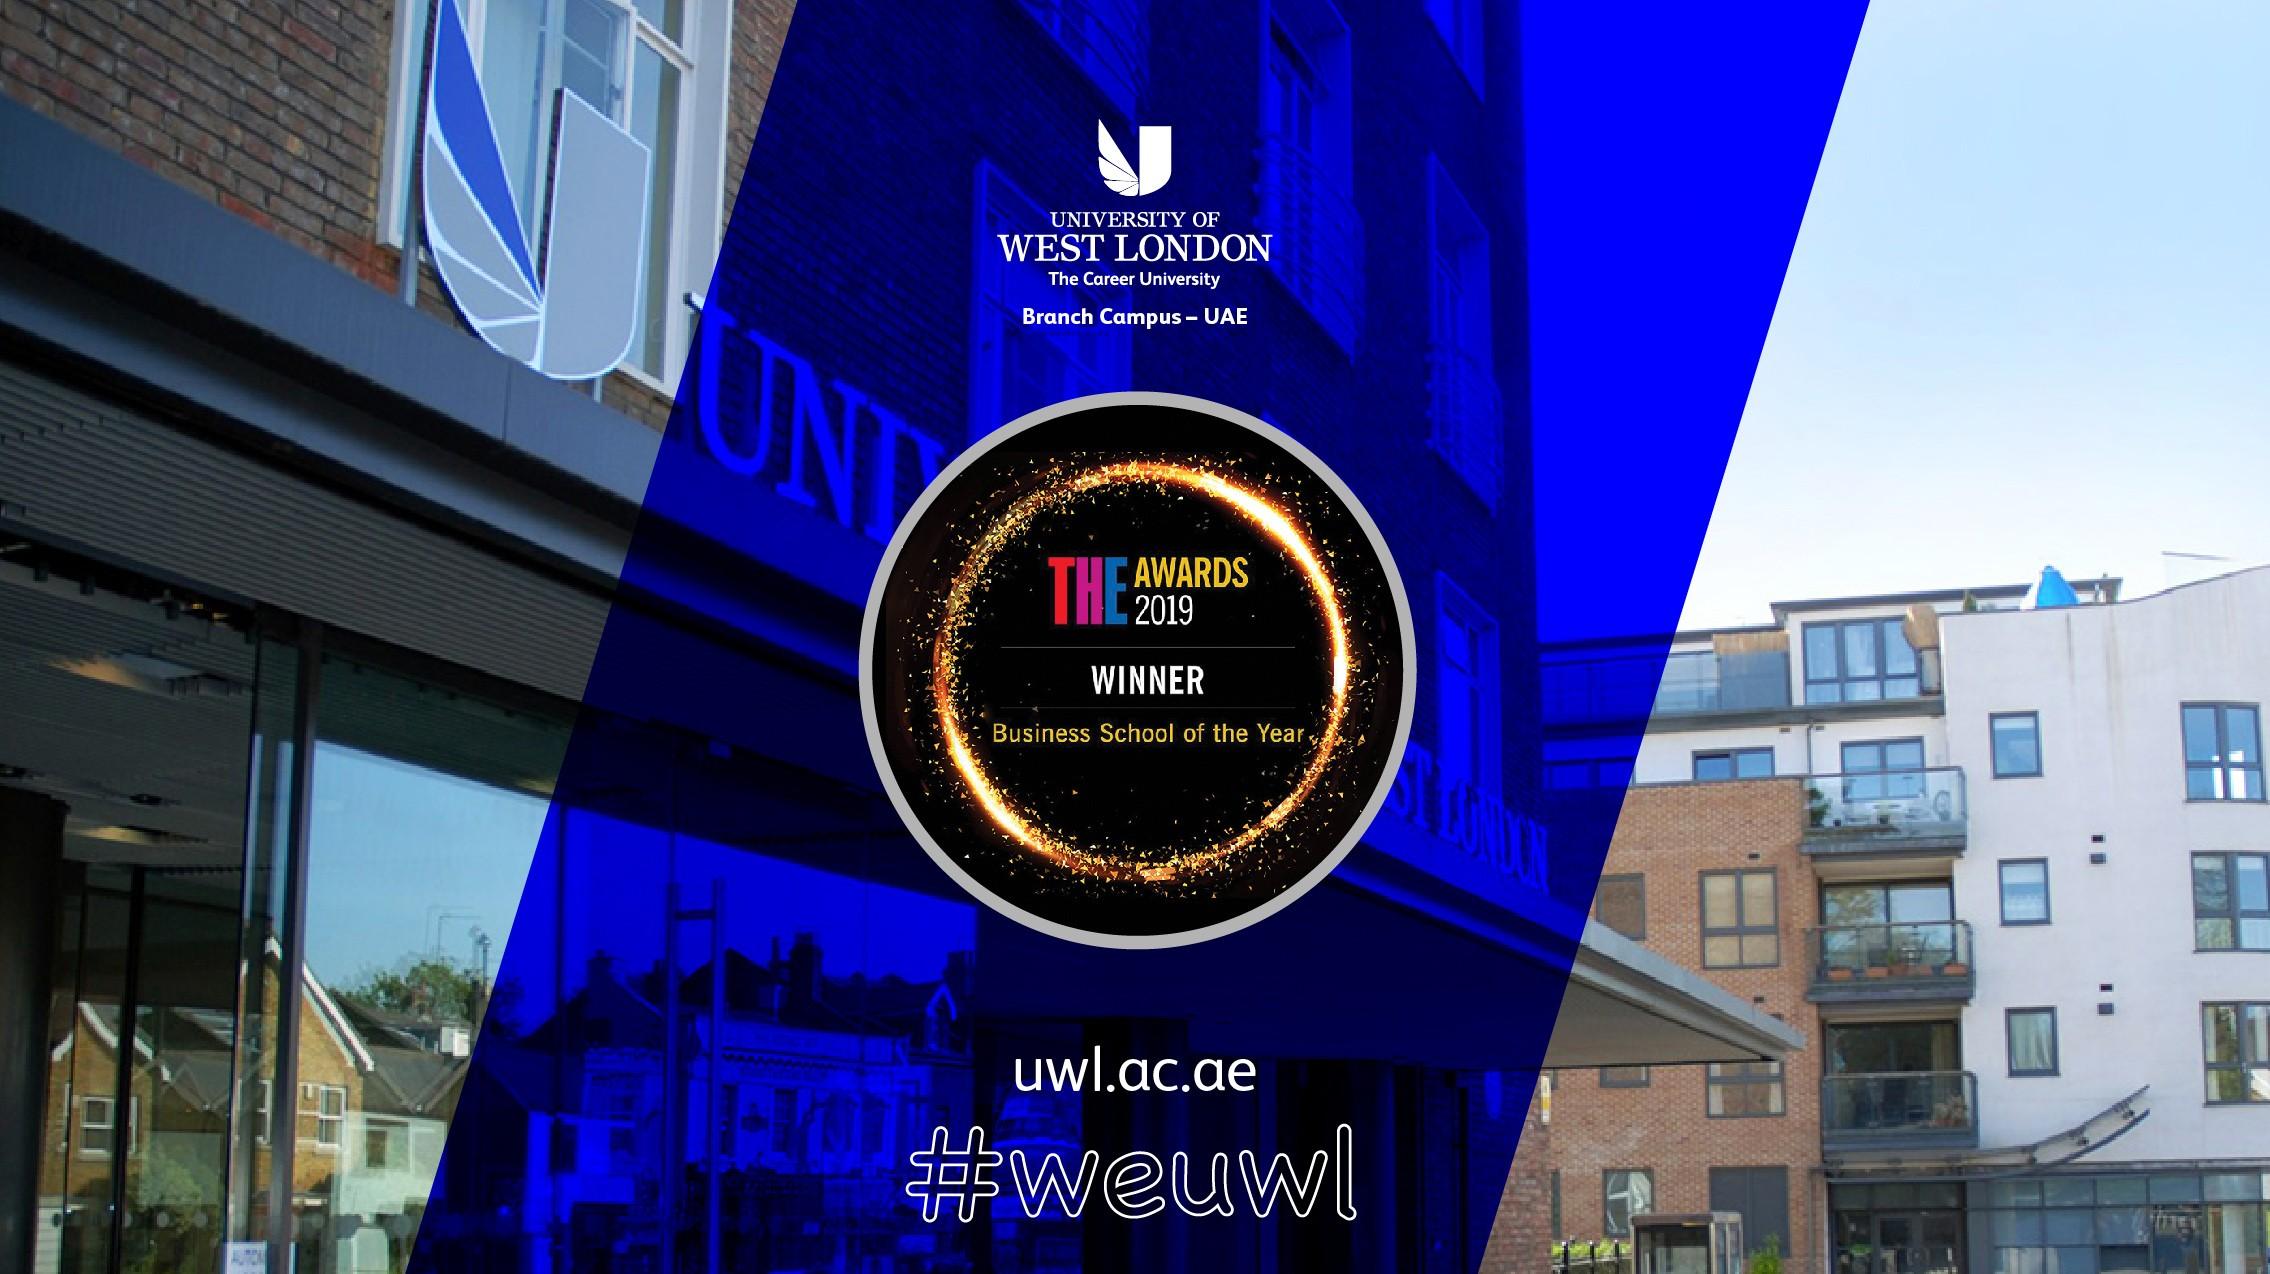 University Of West London Branch Campus Uae Linkedin